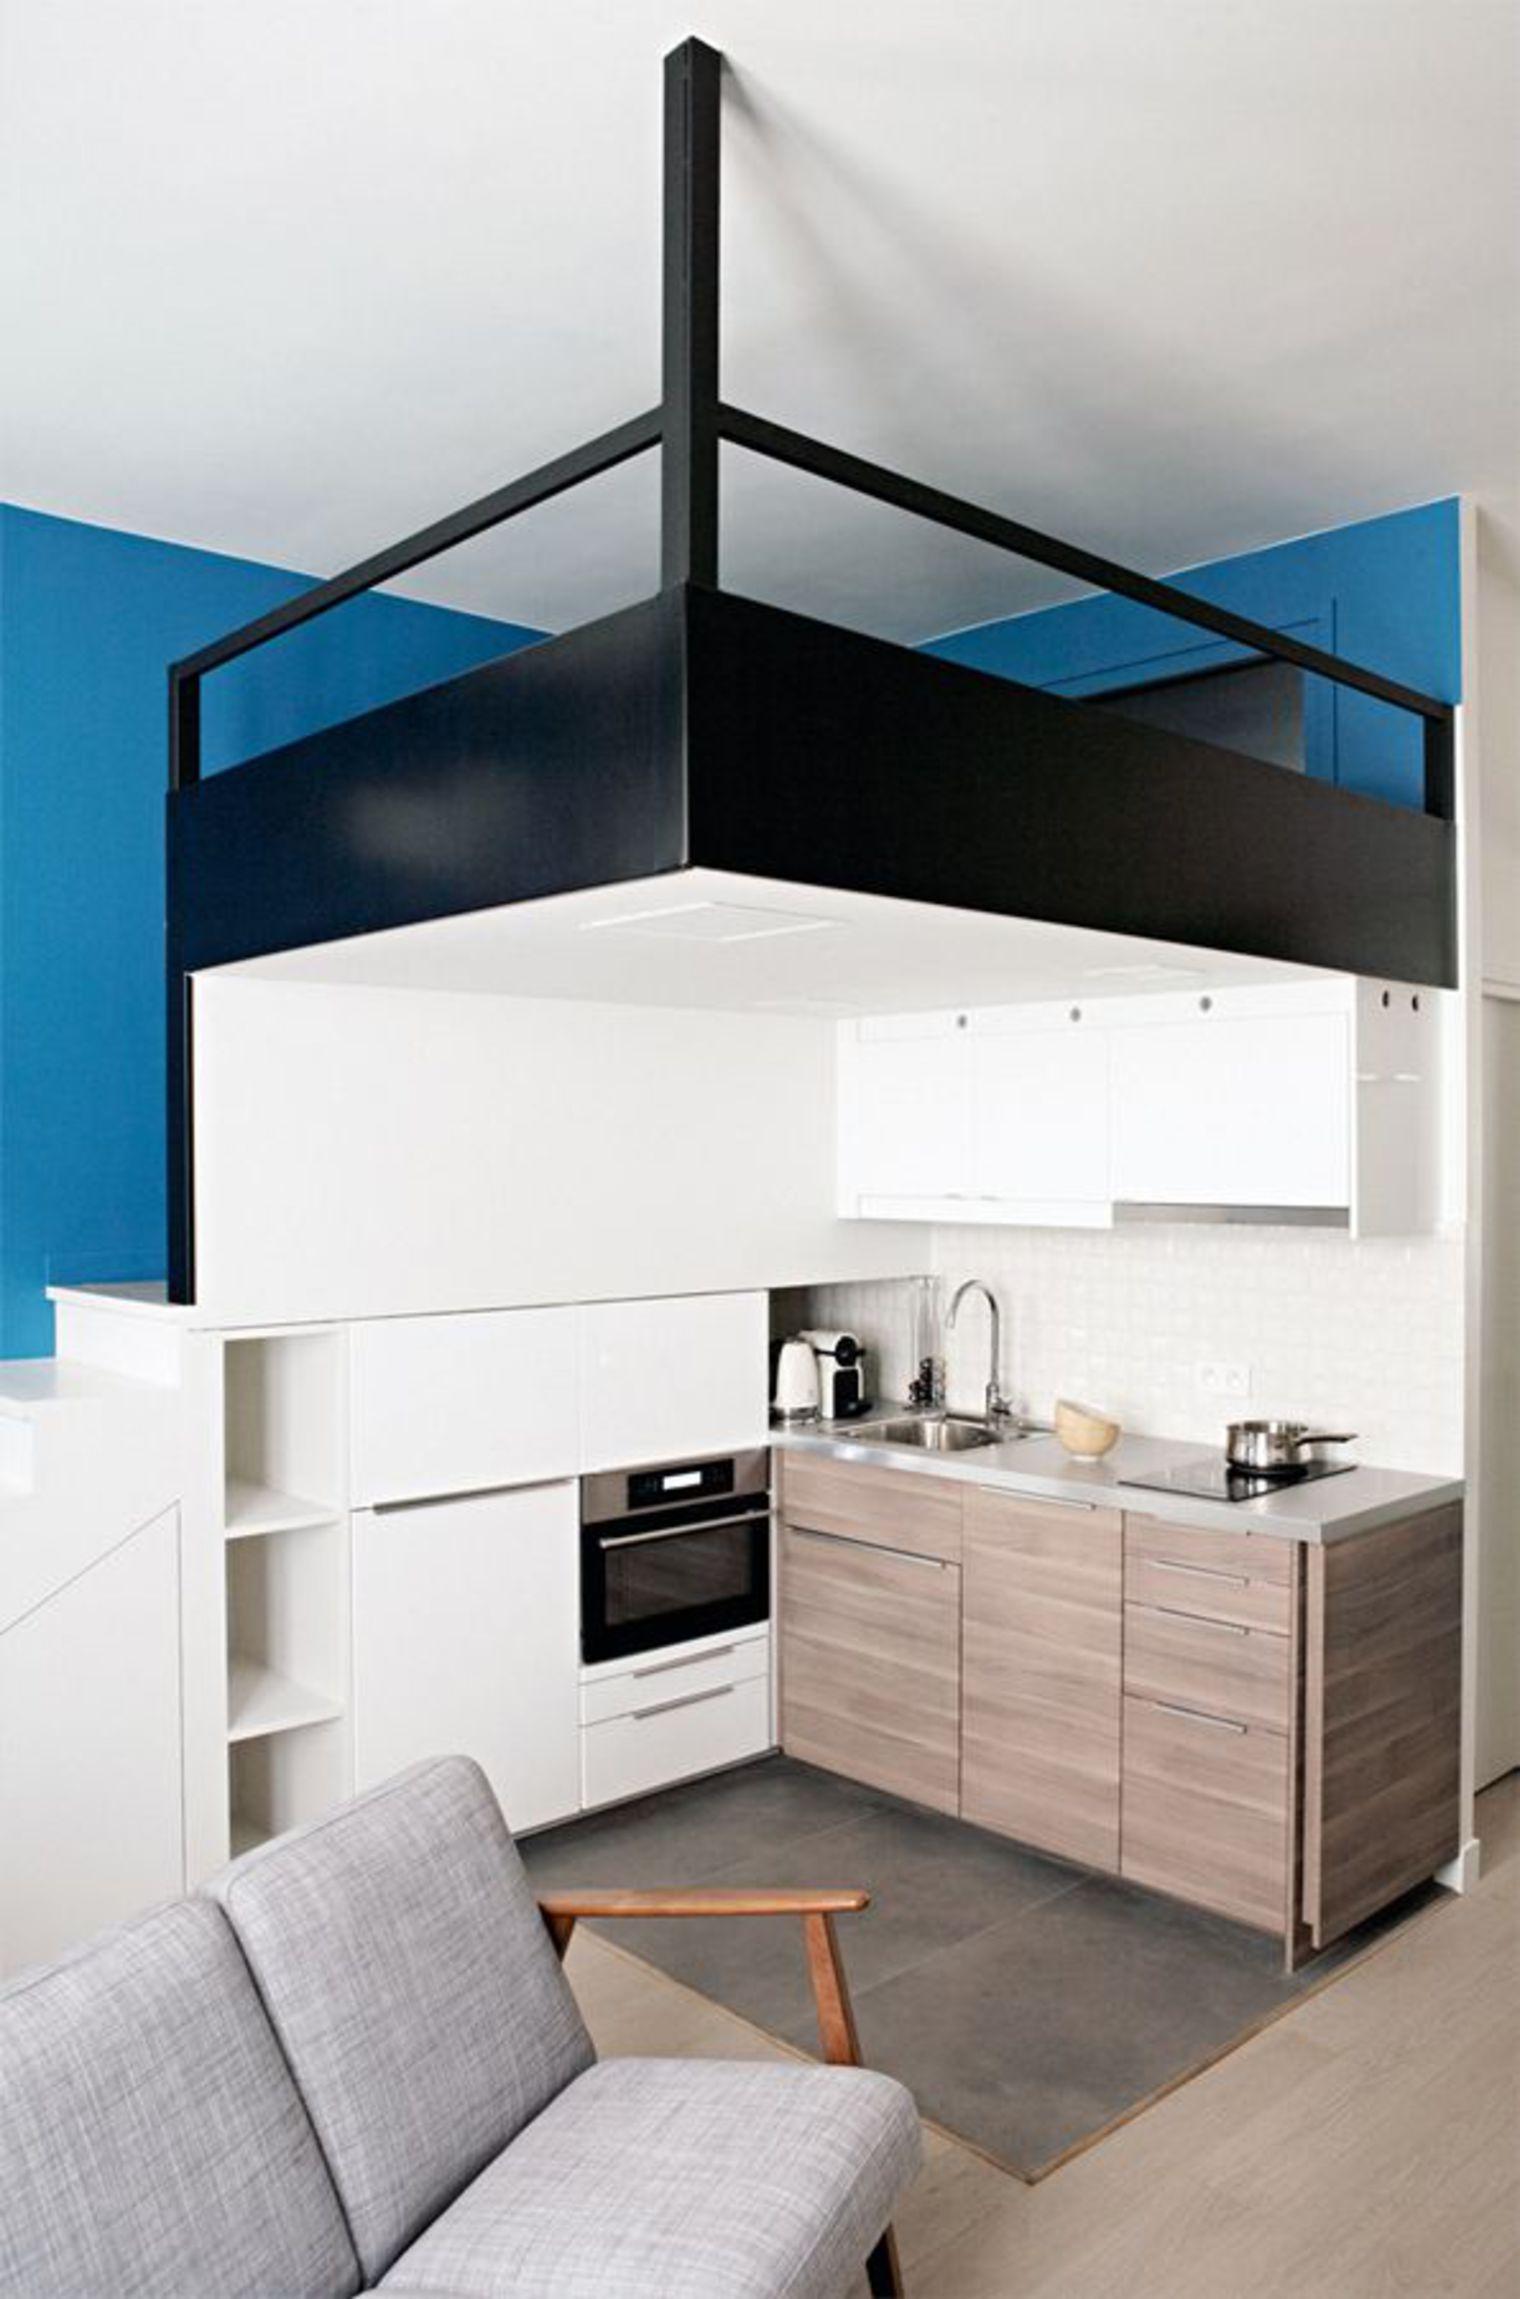 Amenager Une Chambre Dans Un Studio Amenagement Studio 20m2 Comment Amenager Une Petite Chambre Amenagement Studio